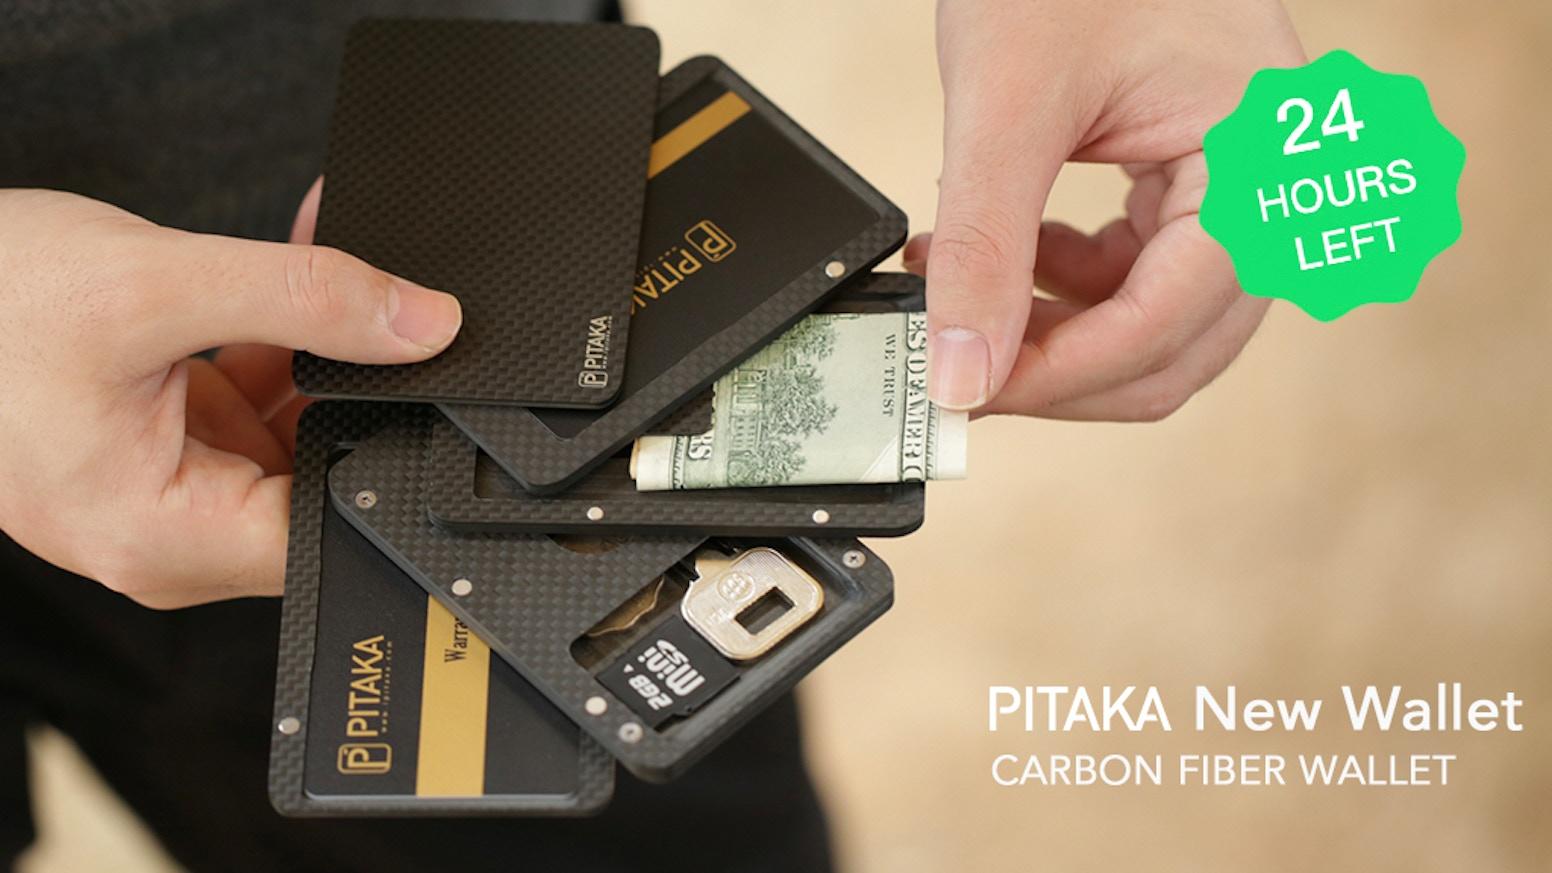 PITAKA - Redefine Carbon Fiber Wallet by PITAKA » IGG